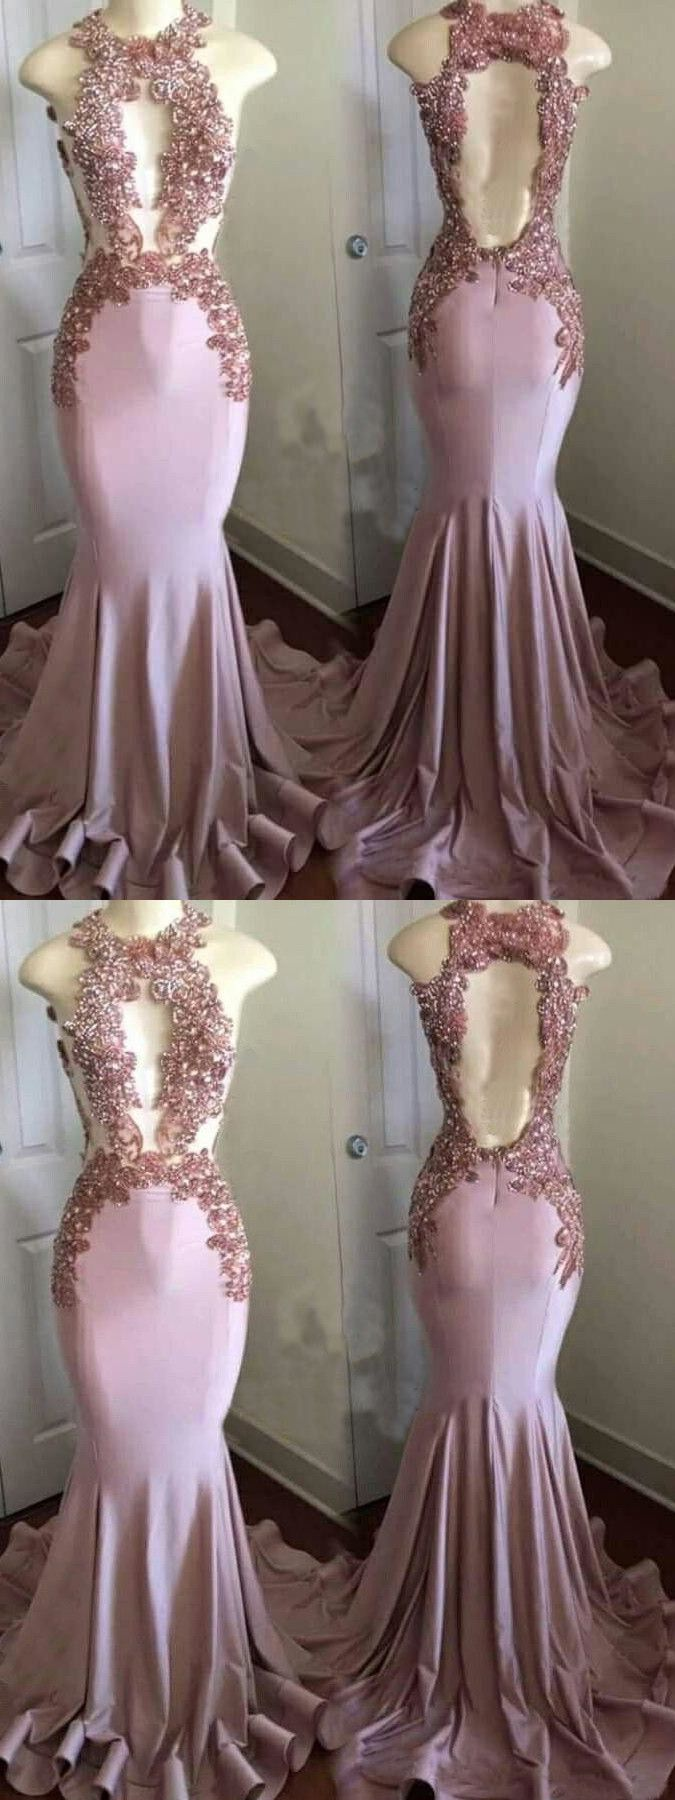 Chic mermaid pink prom dress cheap beautiful long prom dress er